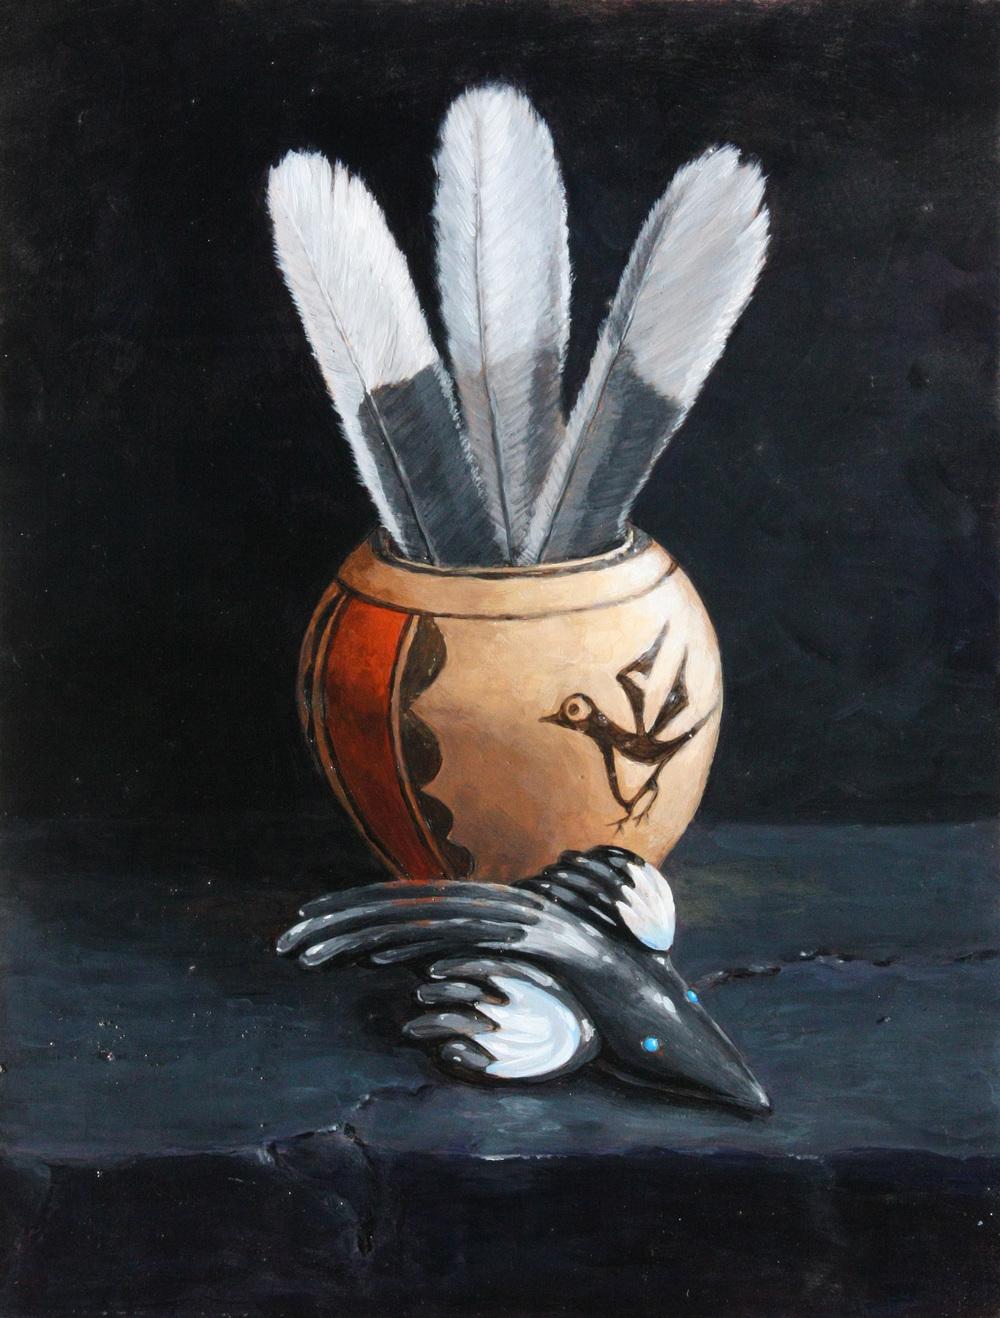 Pueblo Companions - Magpie Feathers & Fetish